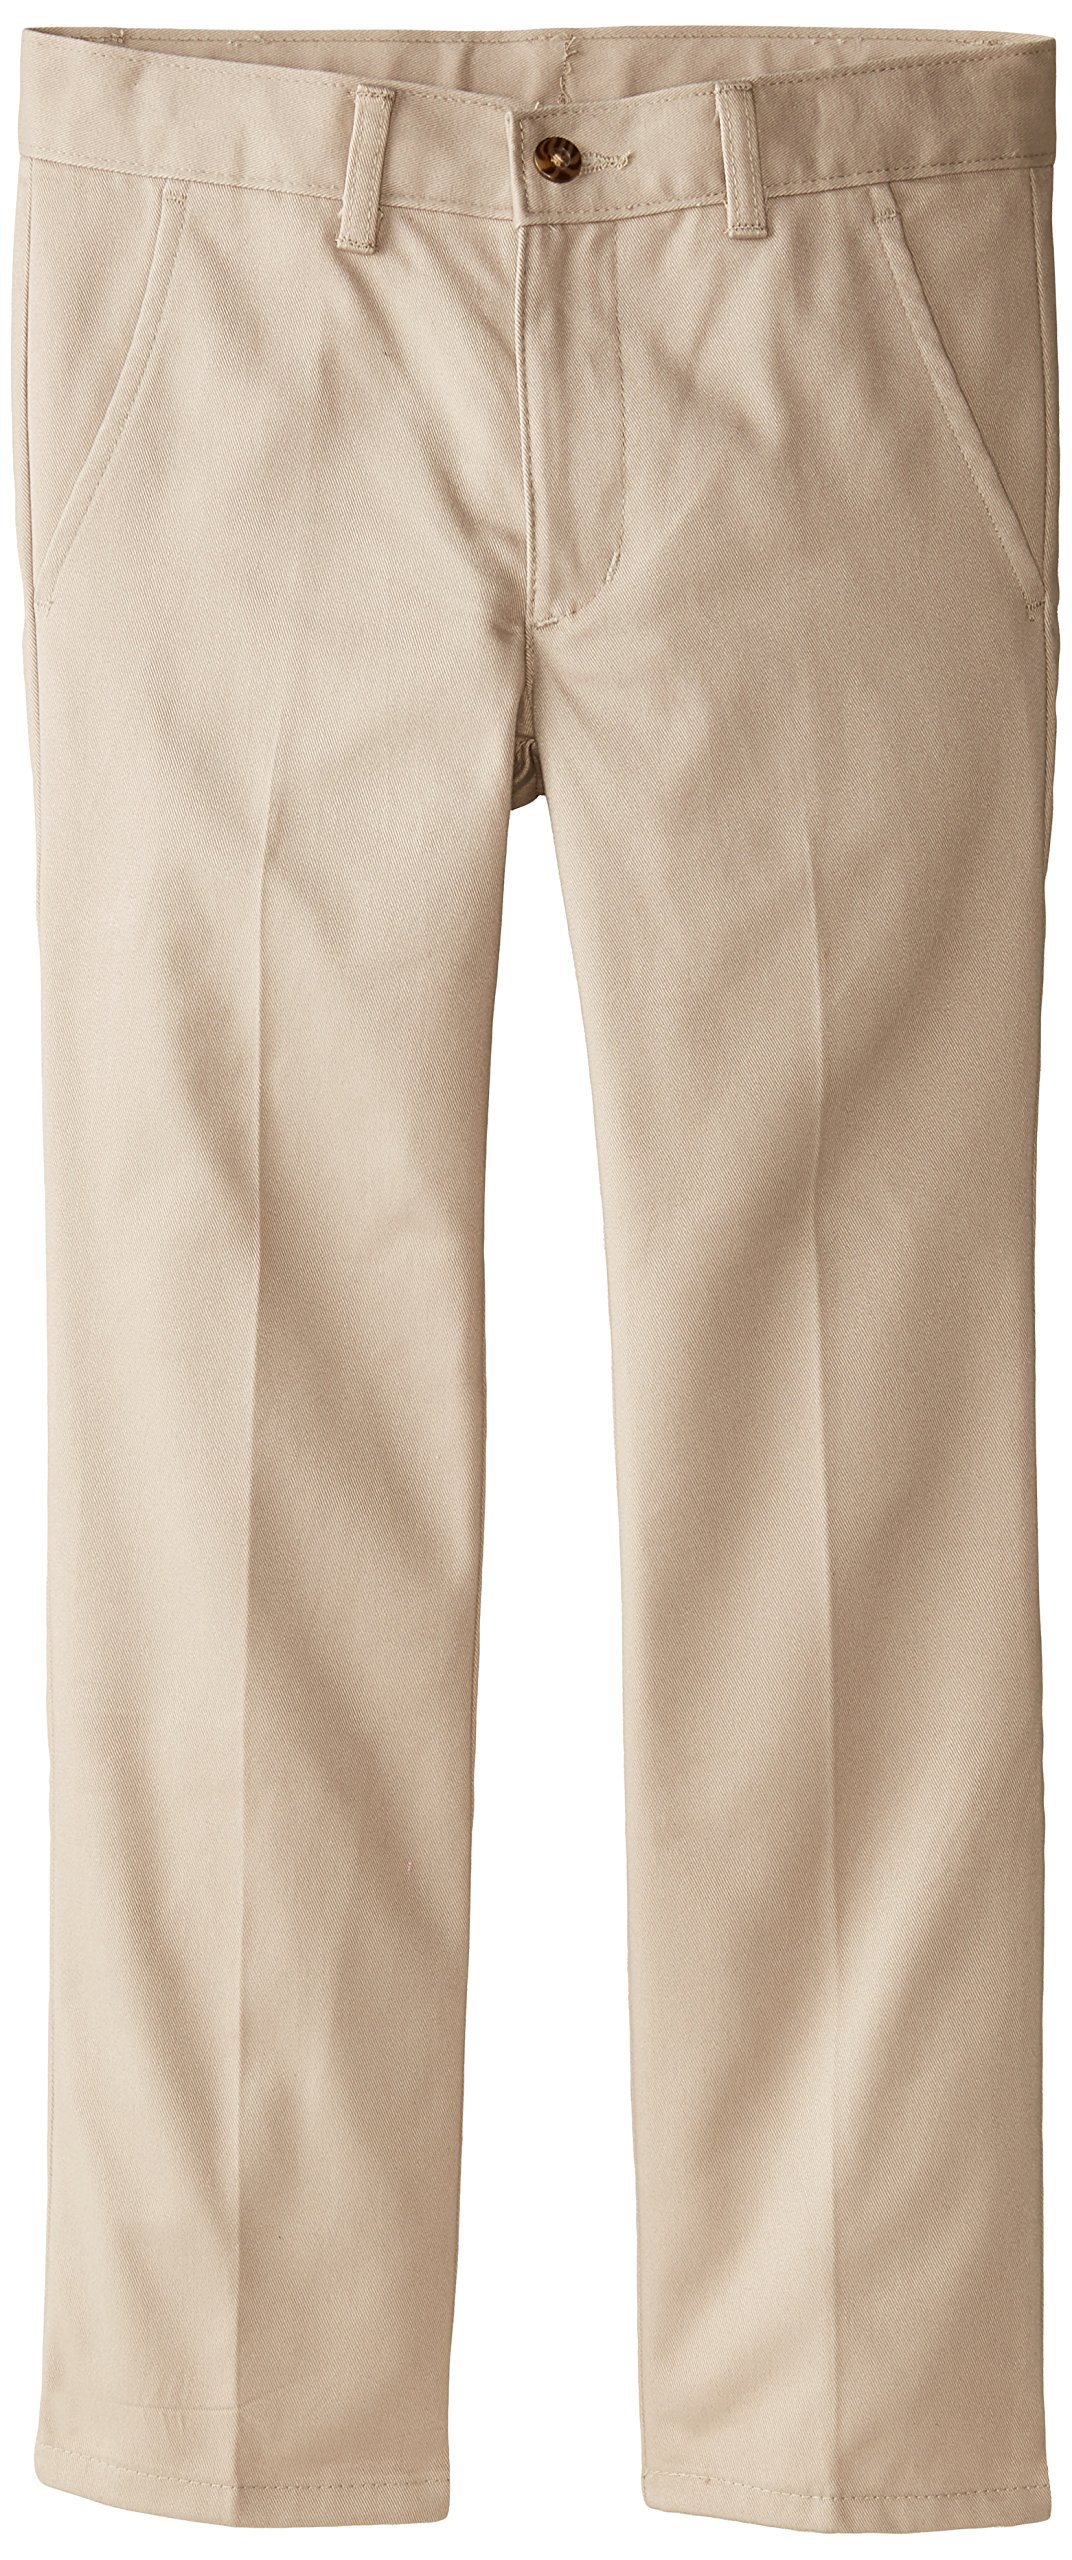 IZOD Little Boys' Double Knee Pant, Khaki, 20 Regular